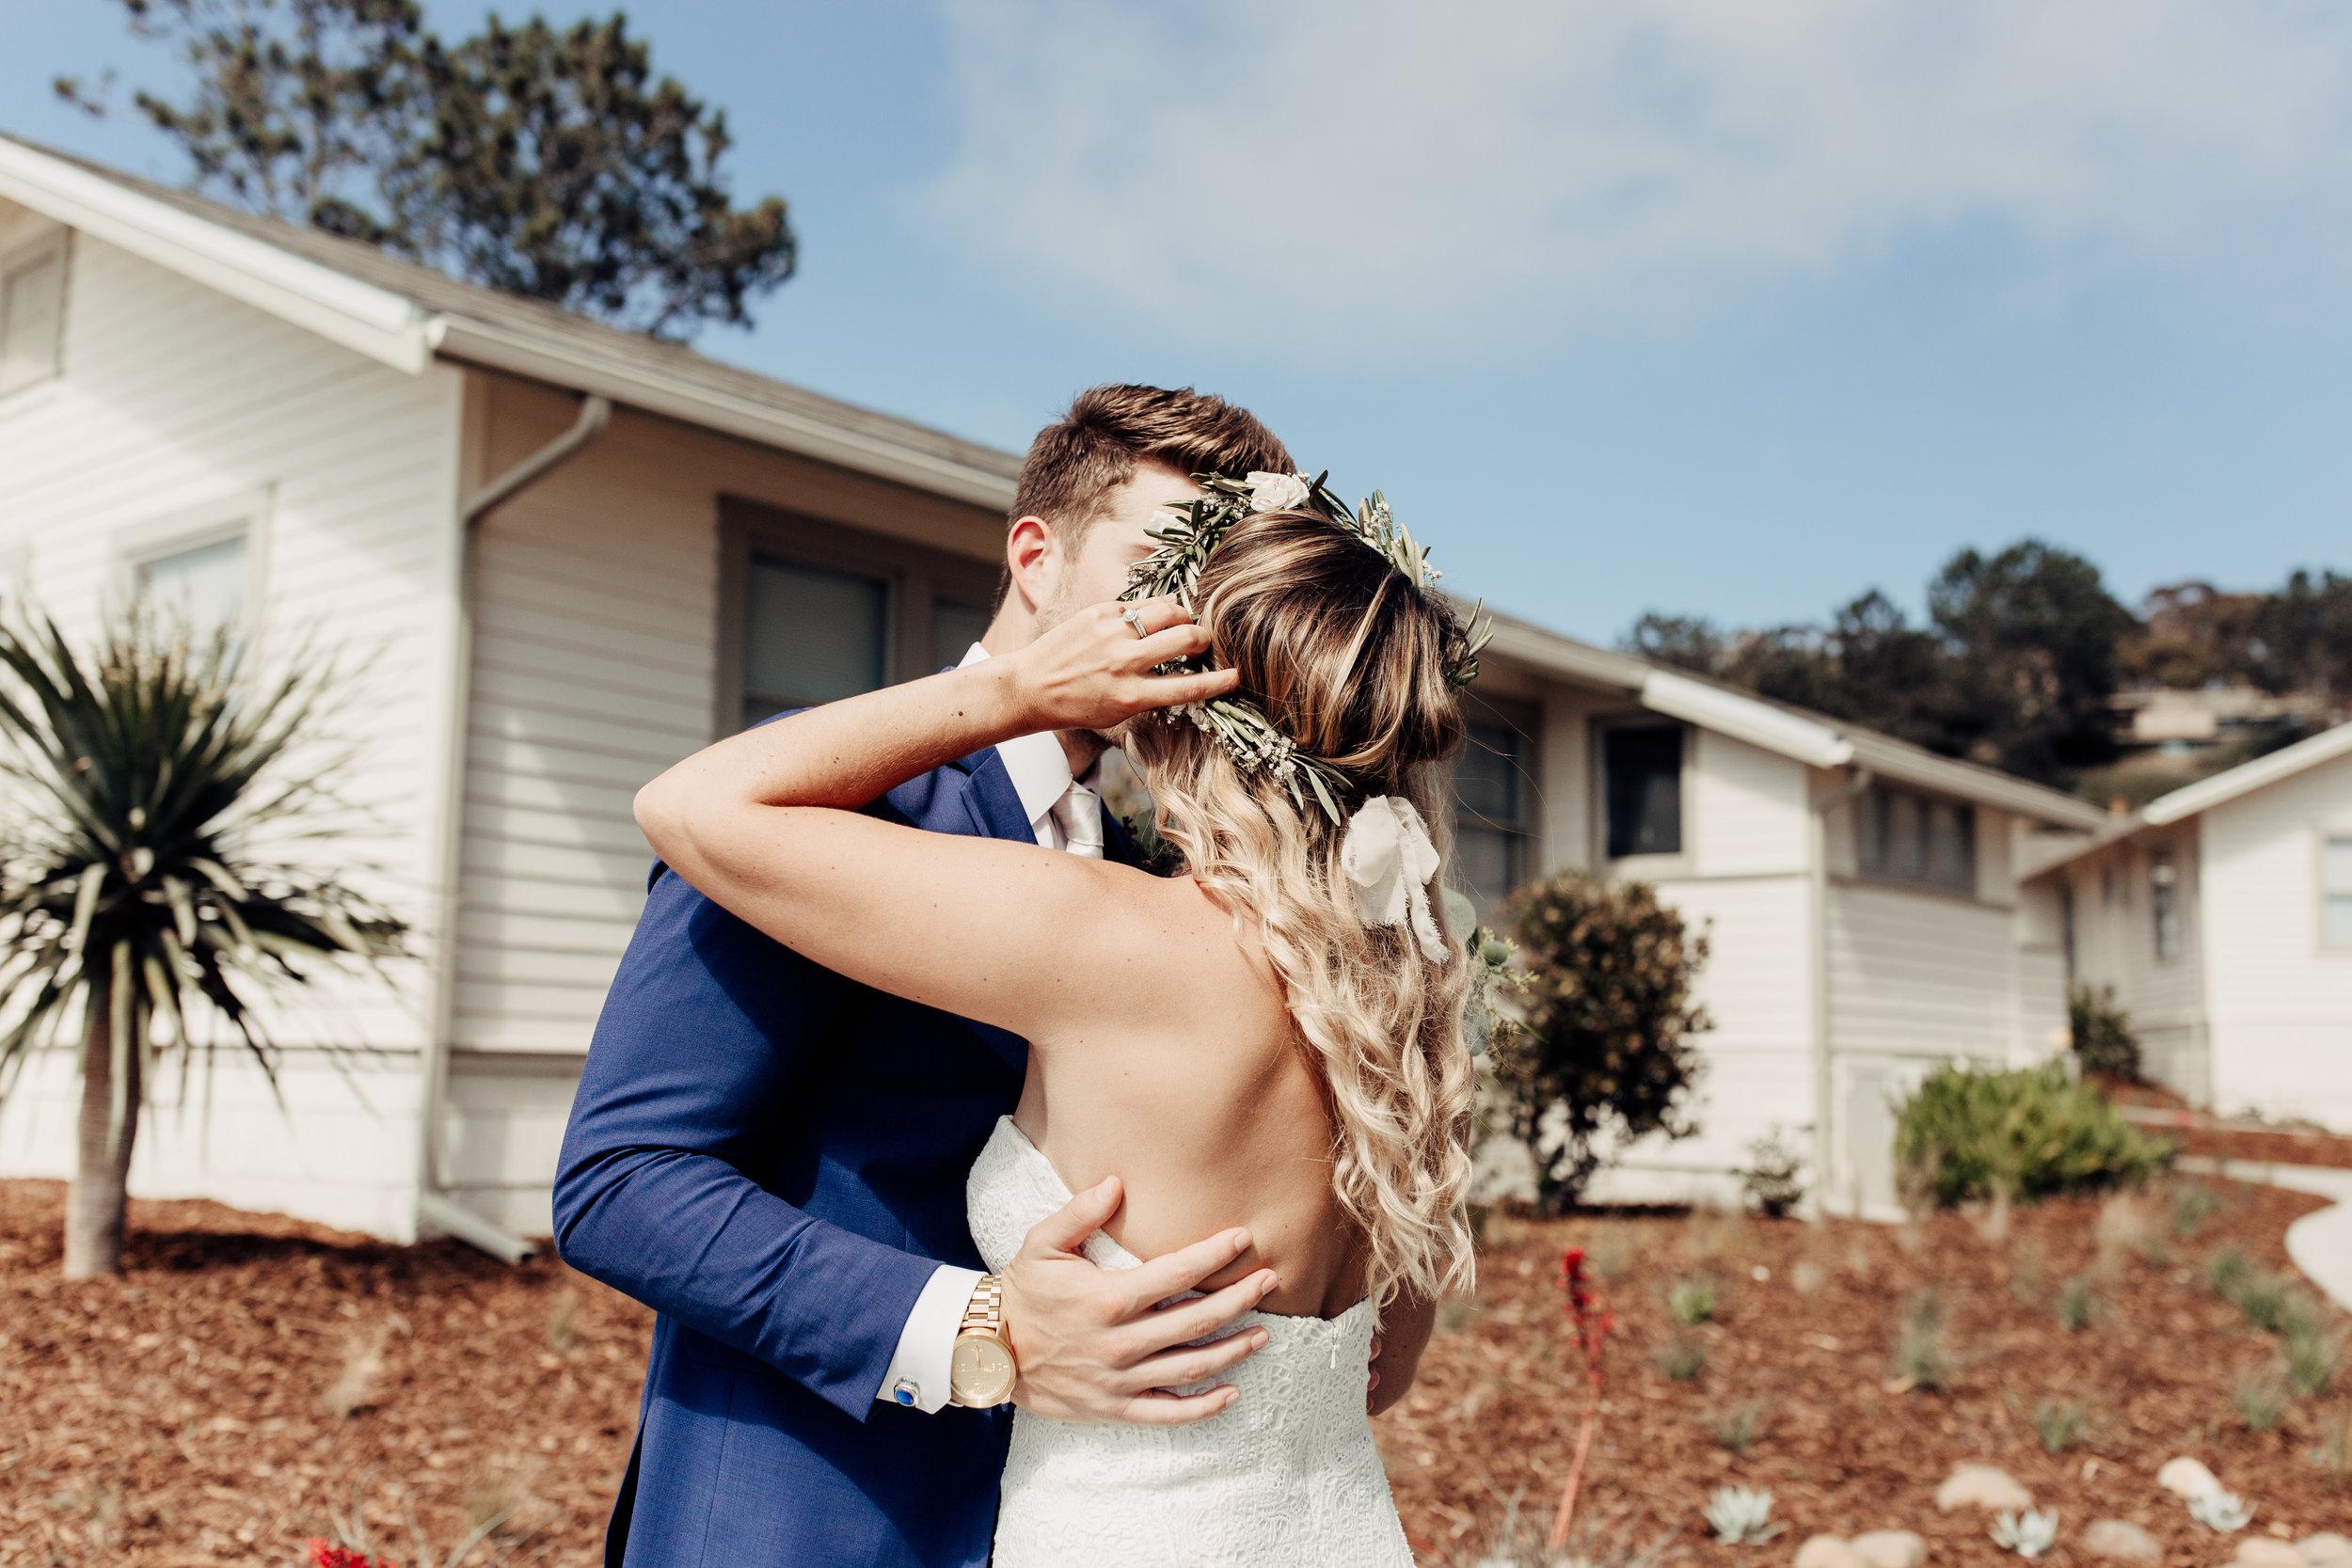 martin-johnson-house-wedding-san-diego4714.jpg